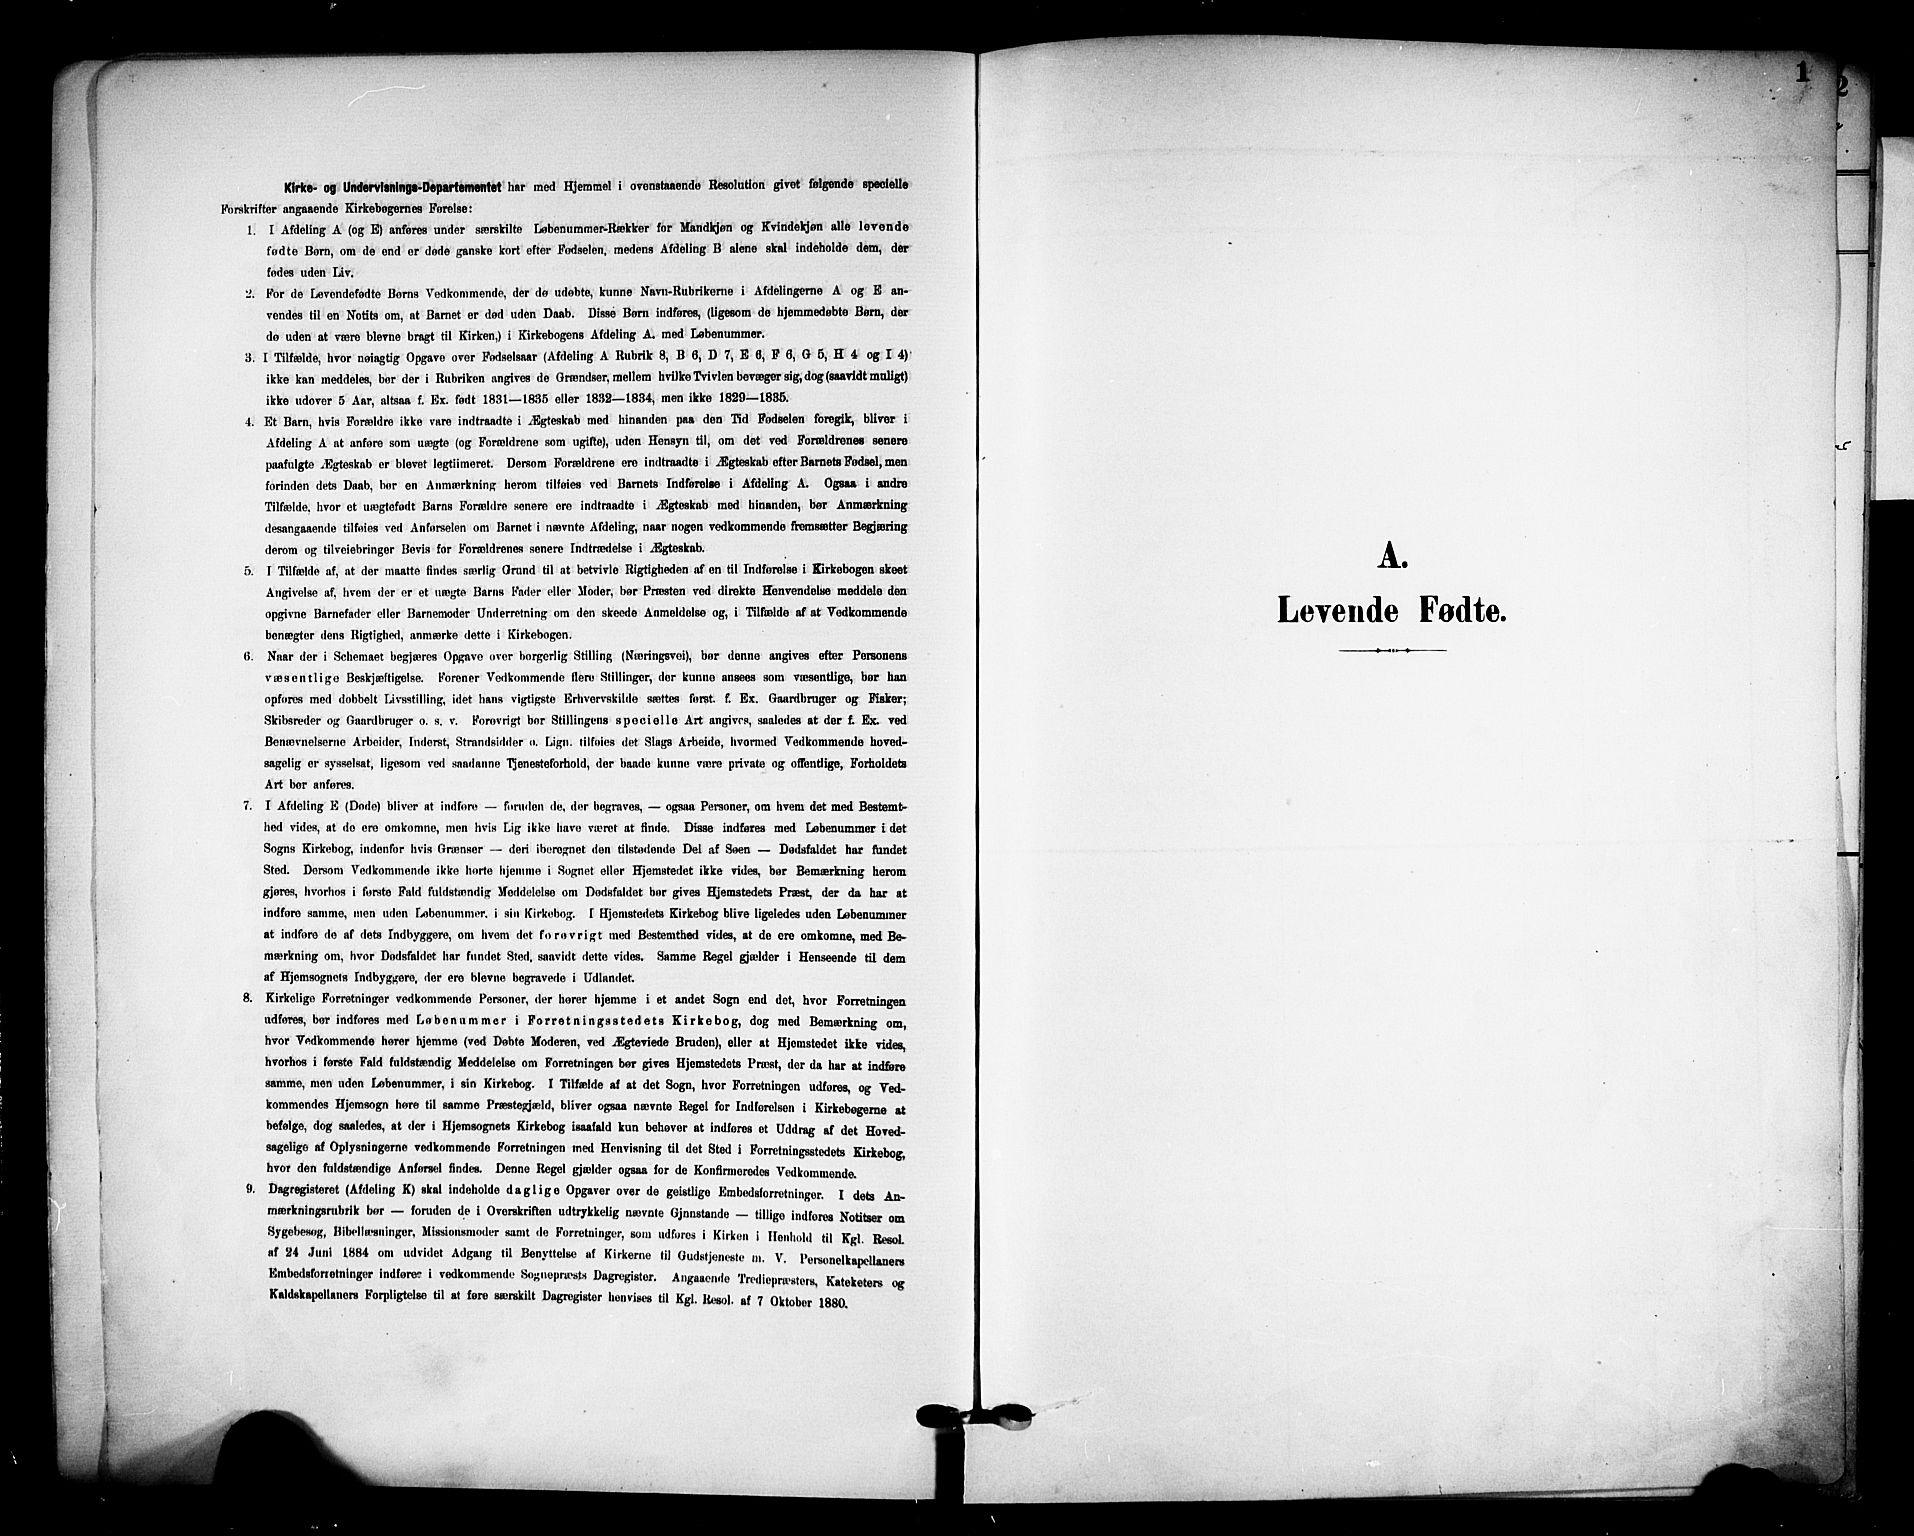 SAKO, Solum kirkebøker, F/Fa/L0011: Ministerialbok nr. I 11, 1898-1909, s. 1